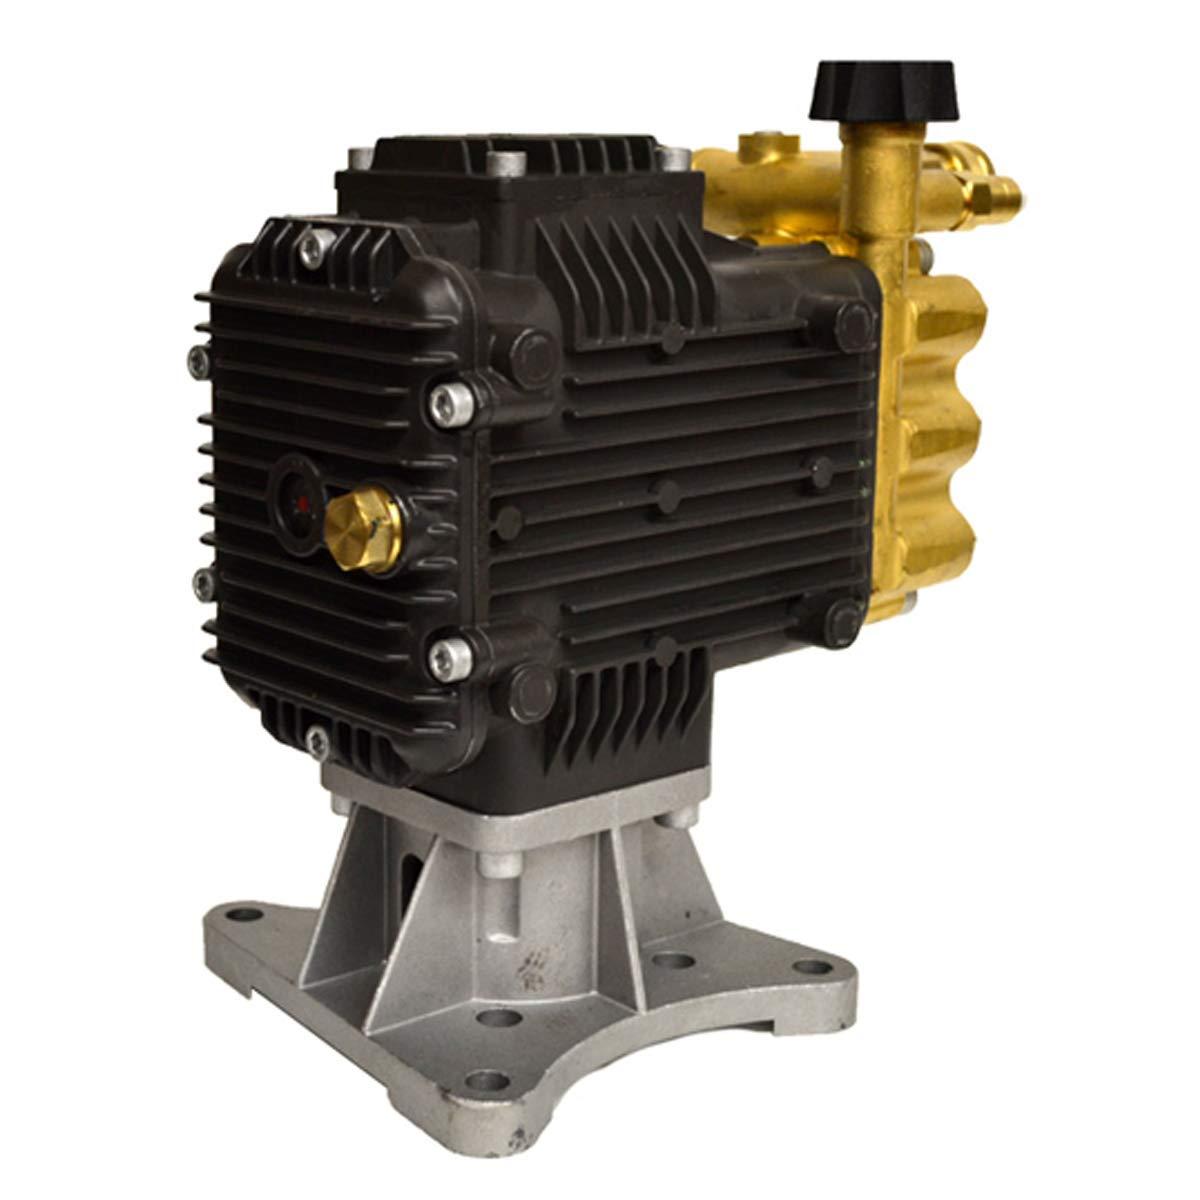 Coleman /& Generac Excel 4000 PSI Anonovi Revereri Cat RRV4G40 /& RSV4G40HDF40EZ 4GPM Replacement Pressure Washer Pump 1 Fits Honda Engine Troy Bilt